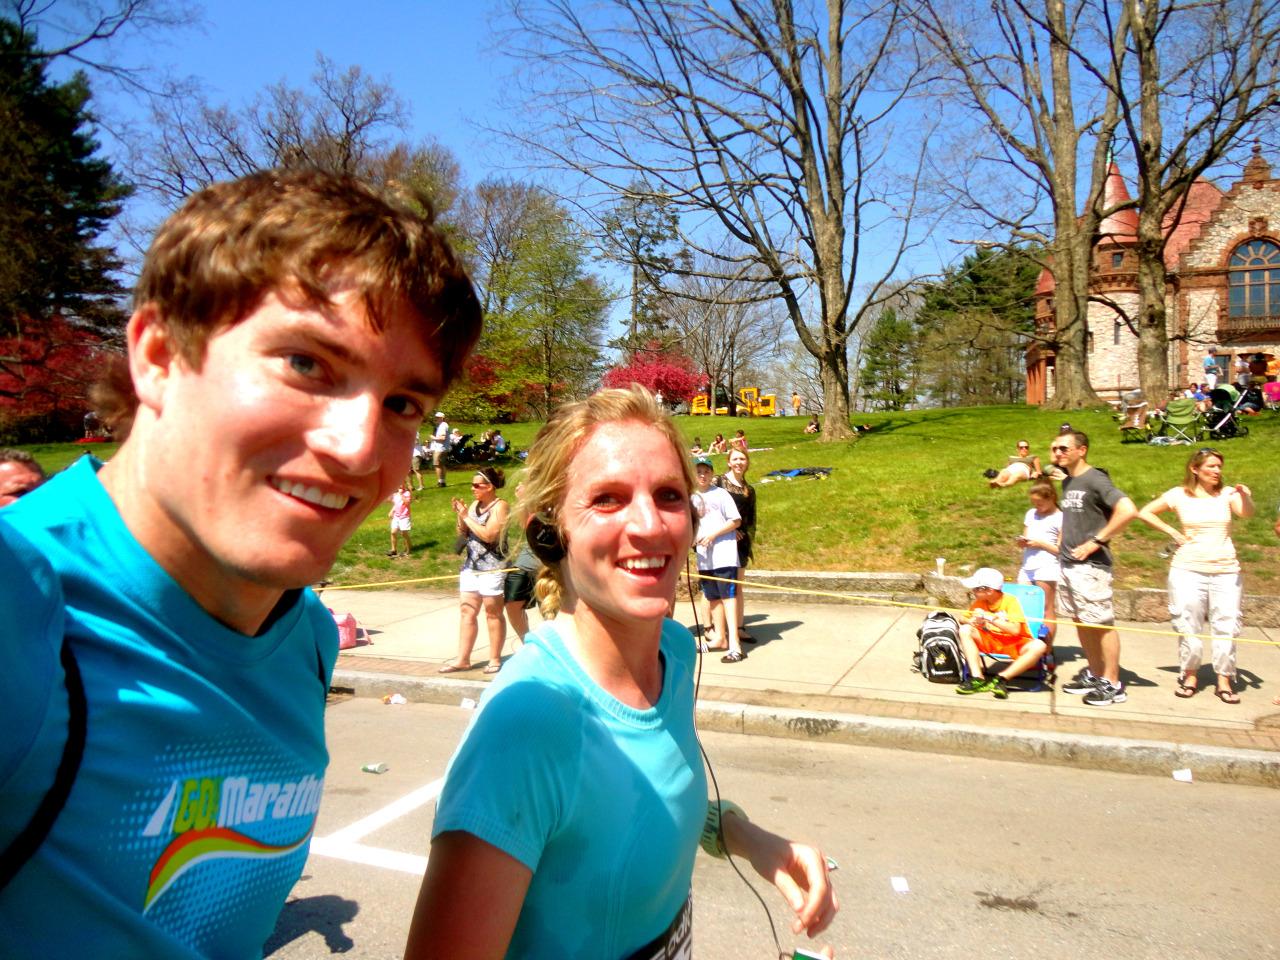 John and I running through last year's Boston race.